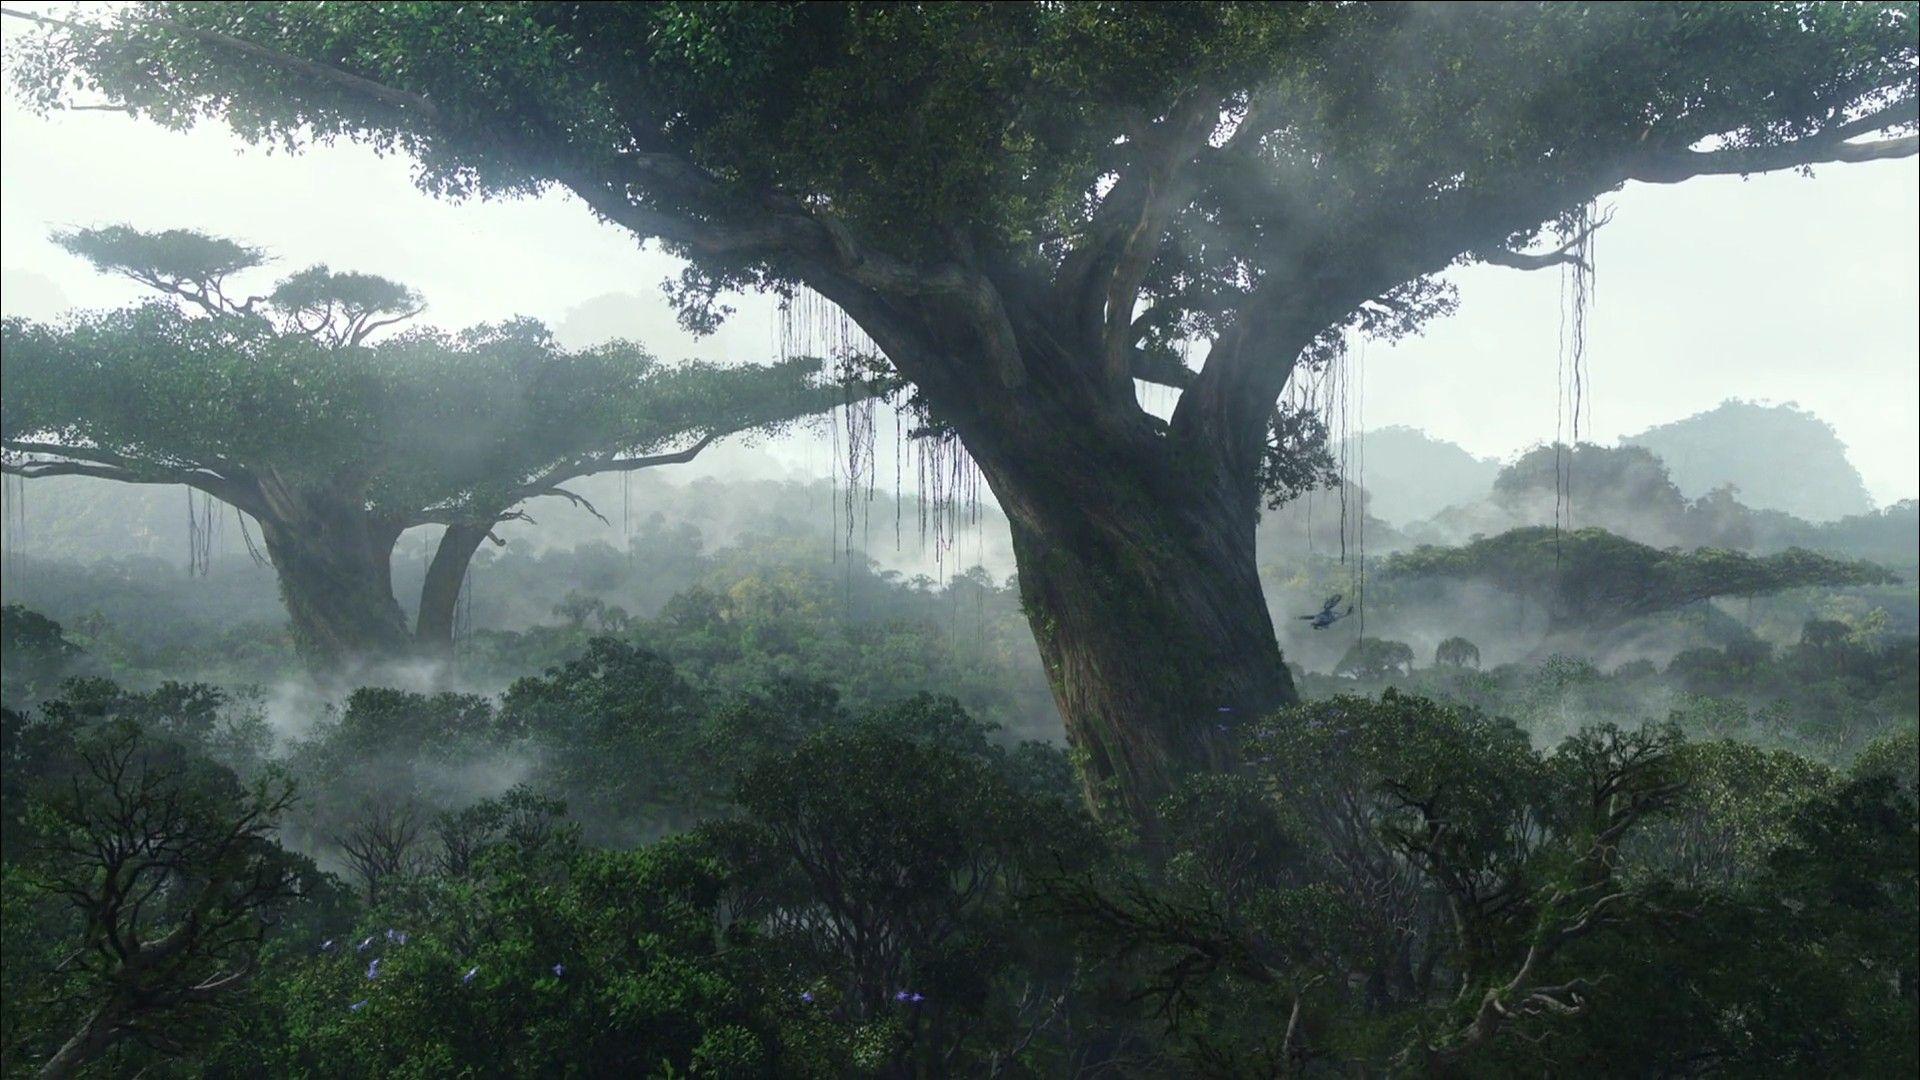 Avatar; Pandora Avatar tree, Jungle wallpaper, Nature